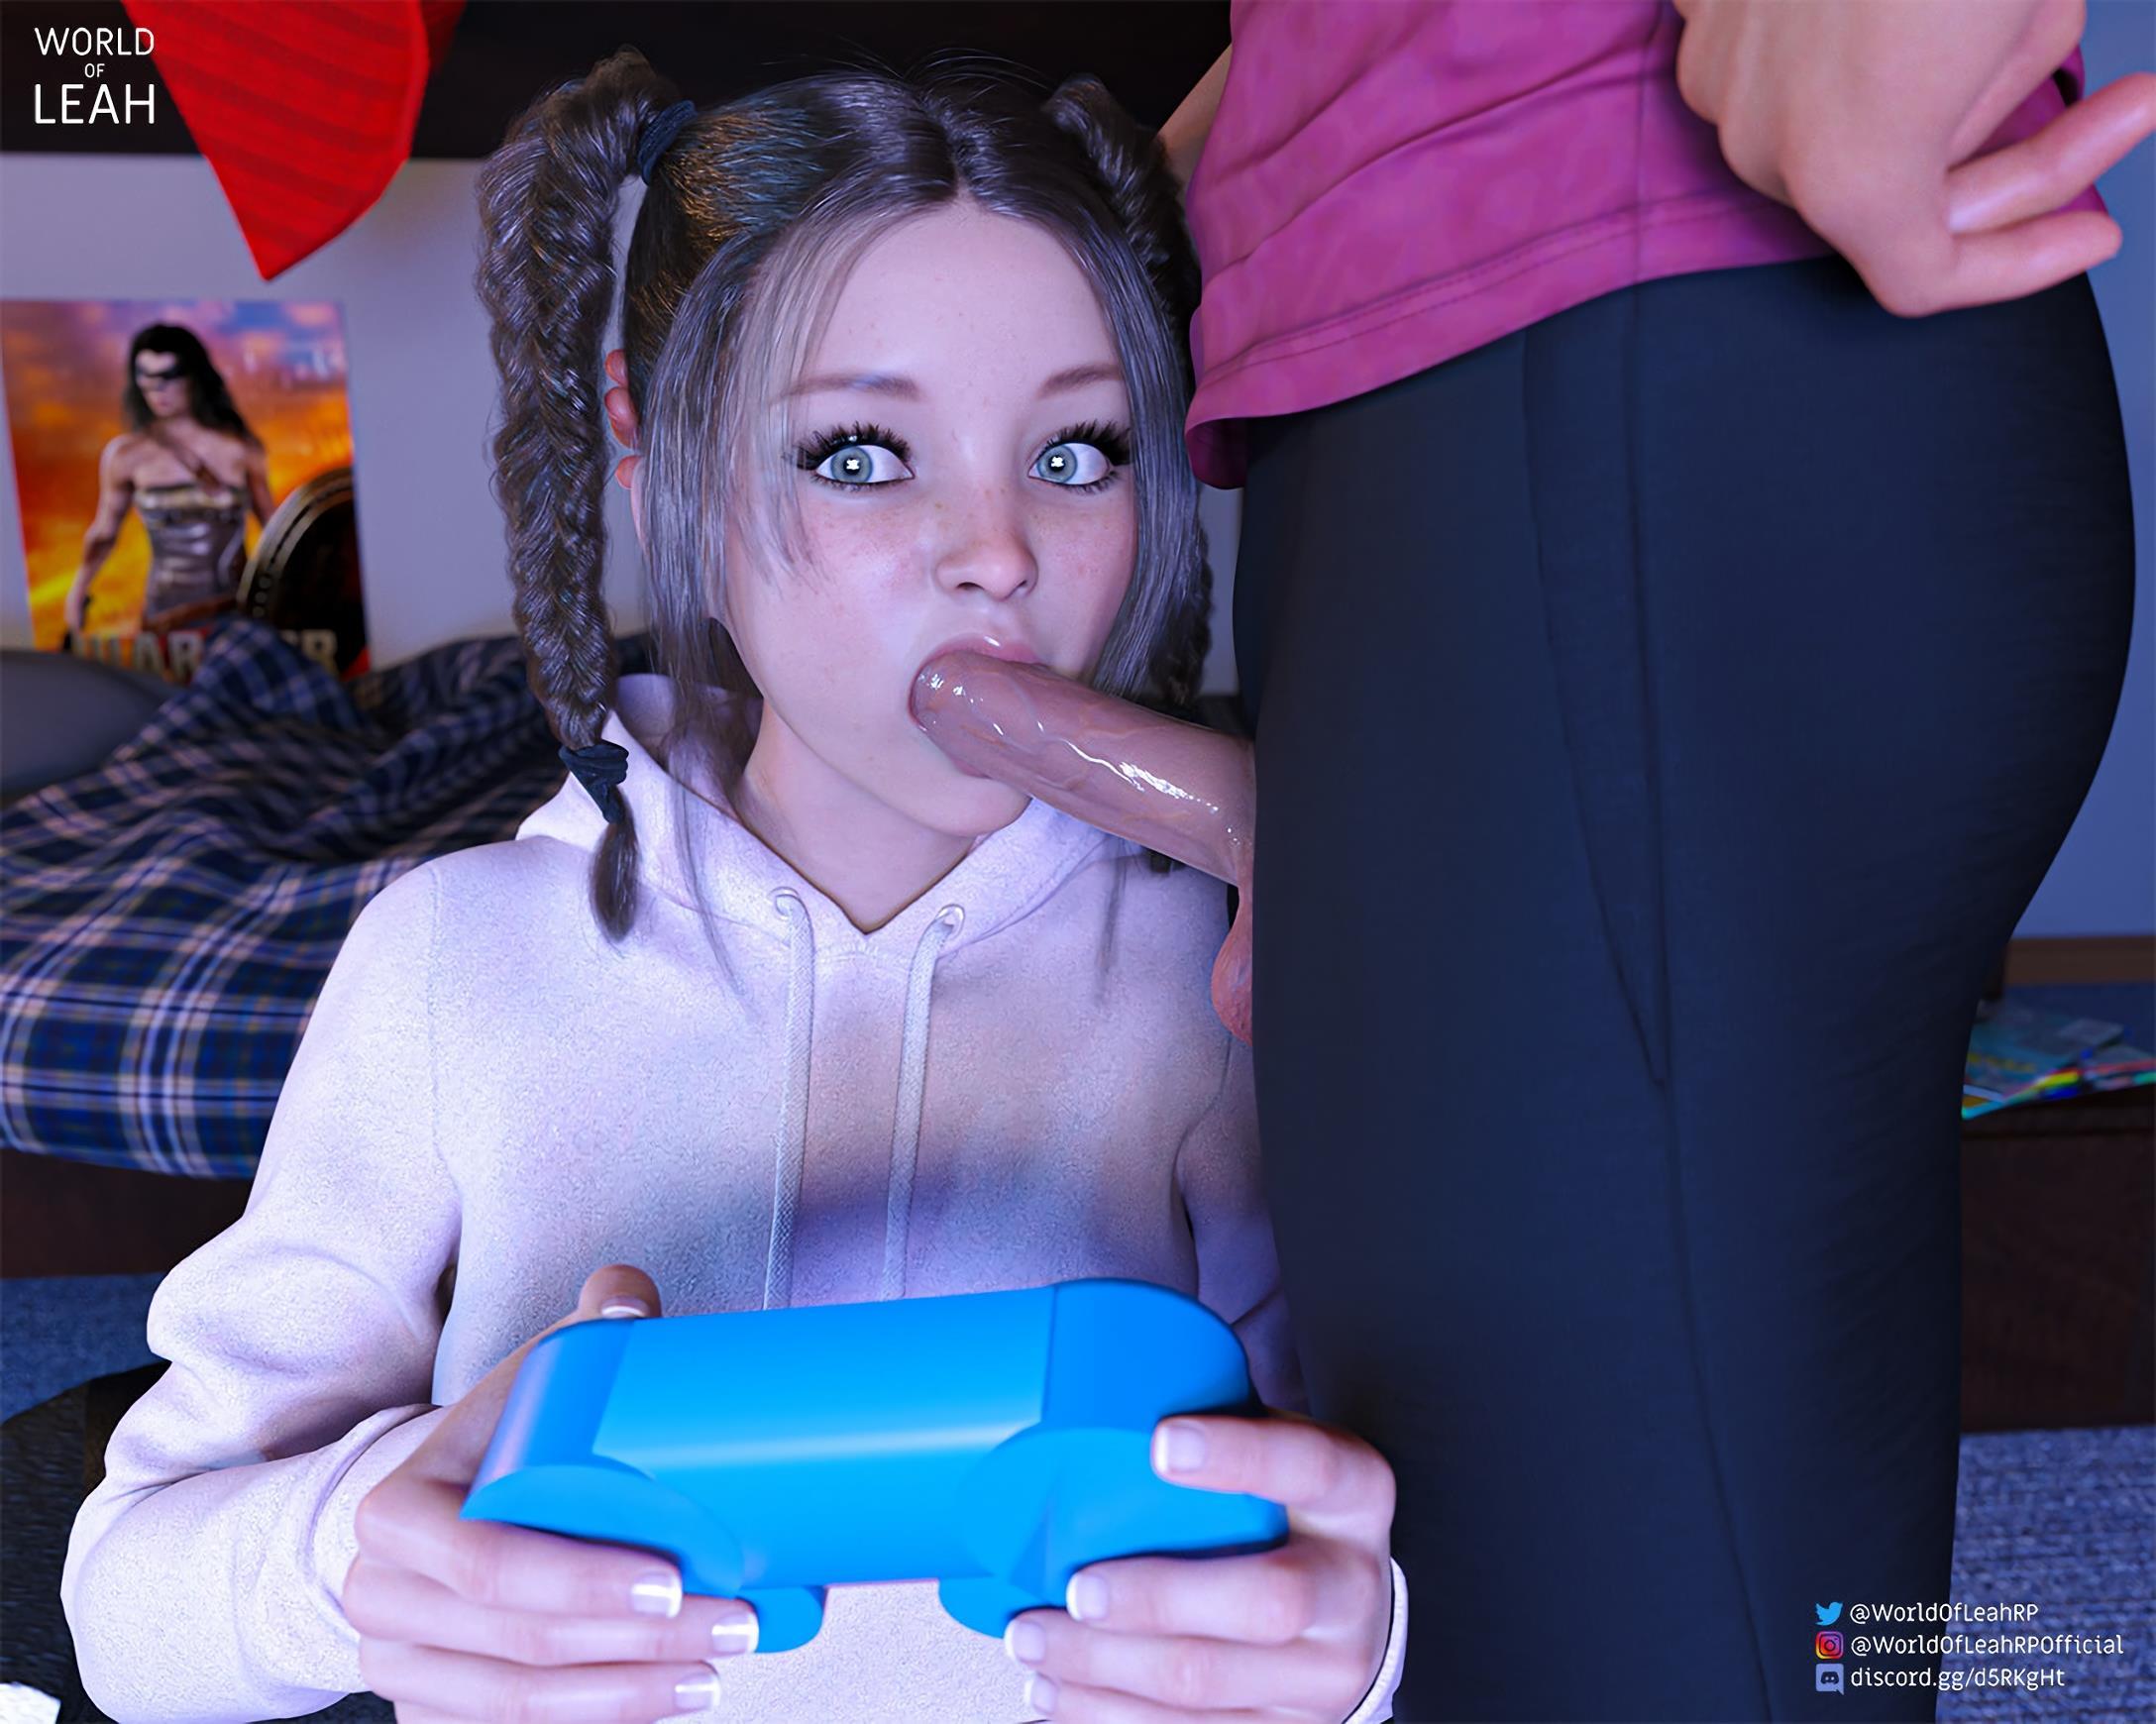 Sexo escola enquanto a nami safada jogava video game